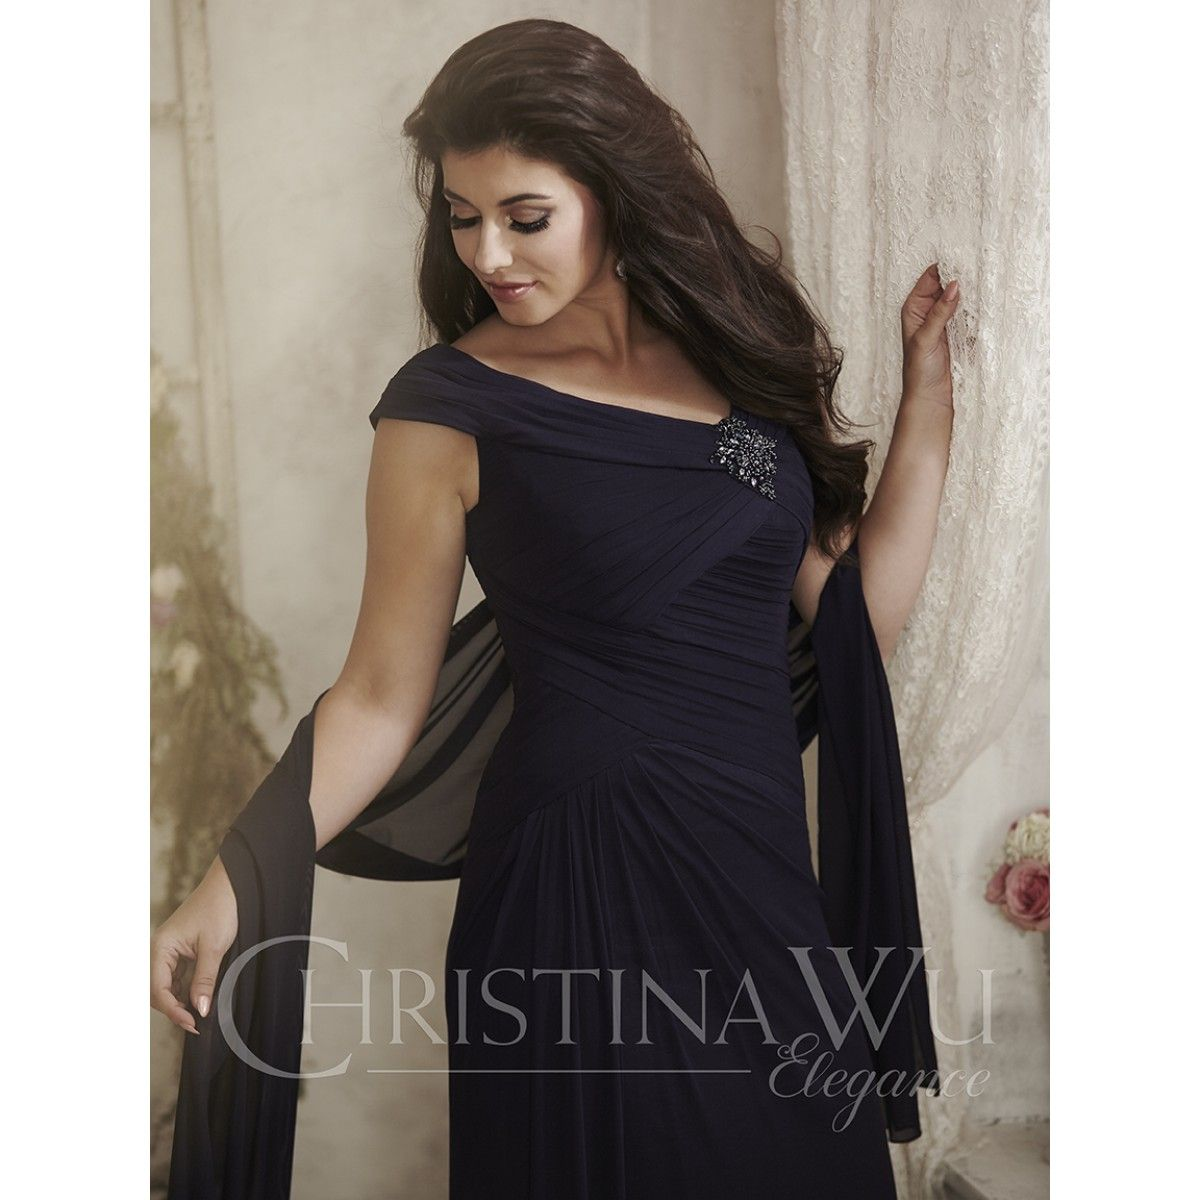 Style christina wu elegance wedding dress pinterest